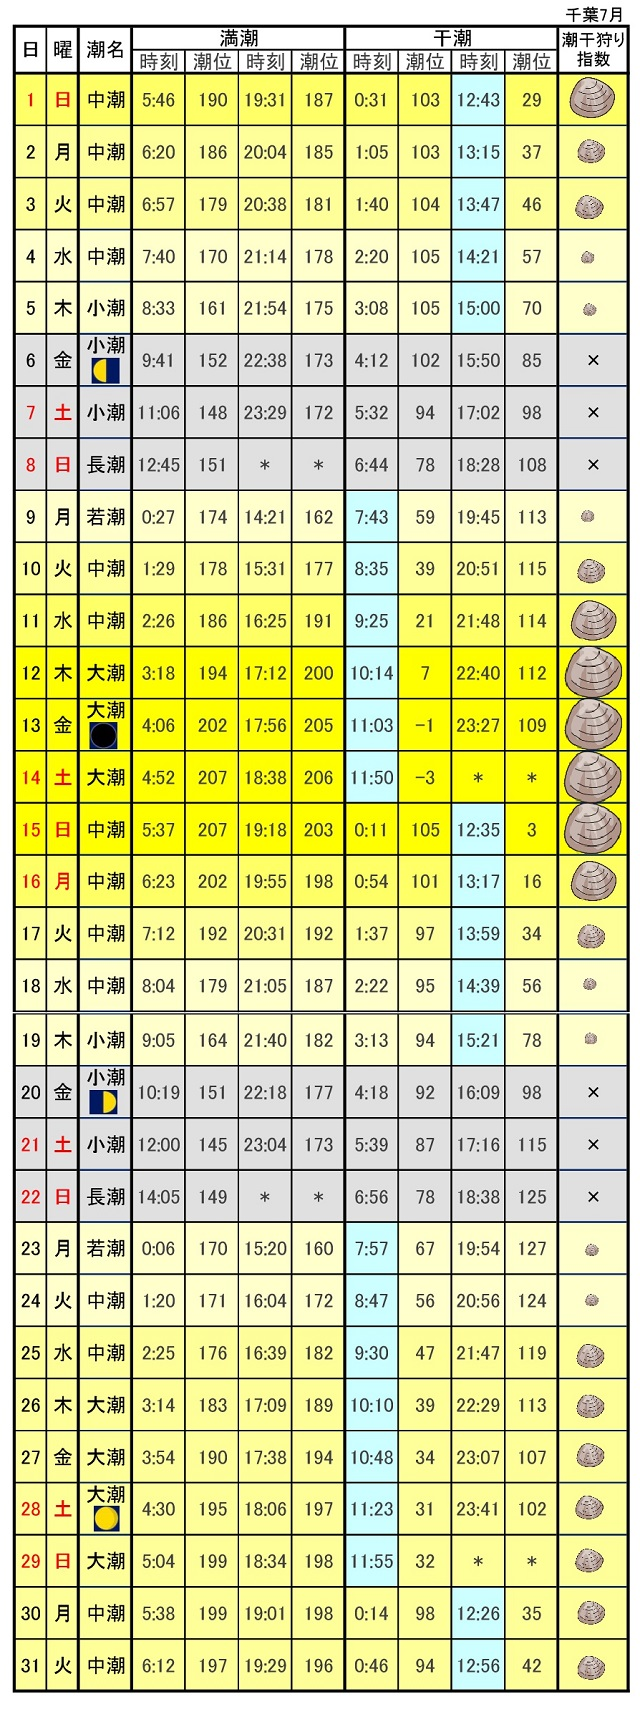 千葉県東京湾潮干狩り潮見表2018年7月